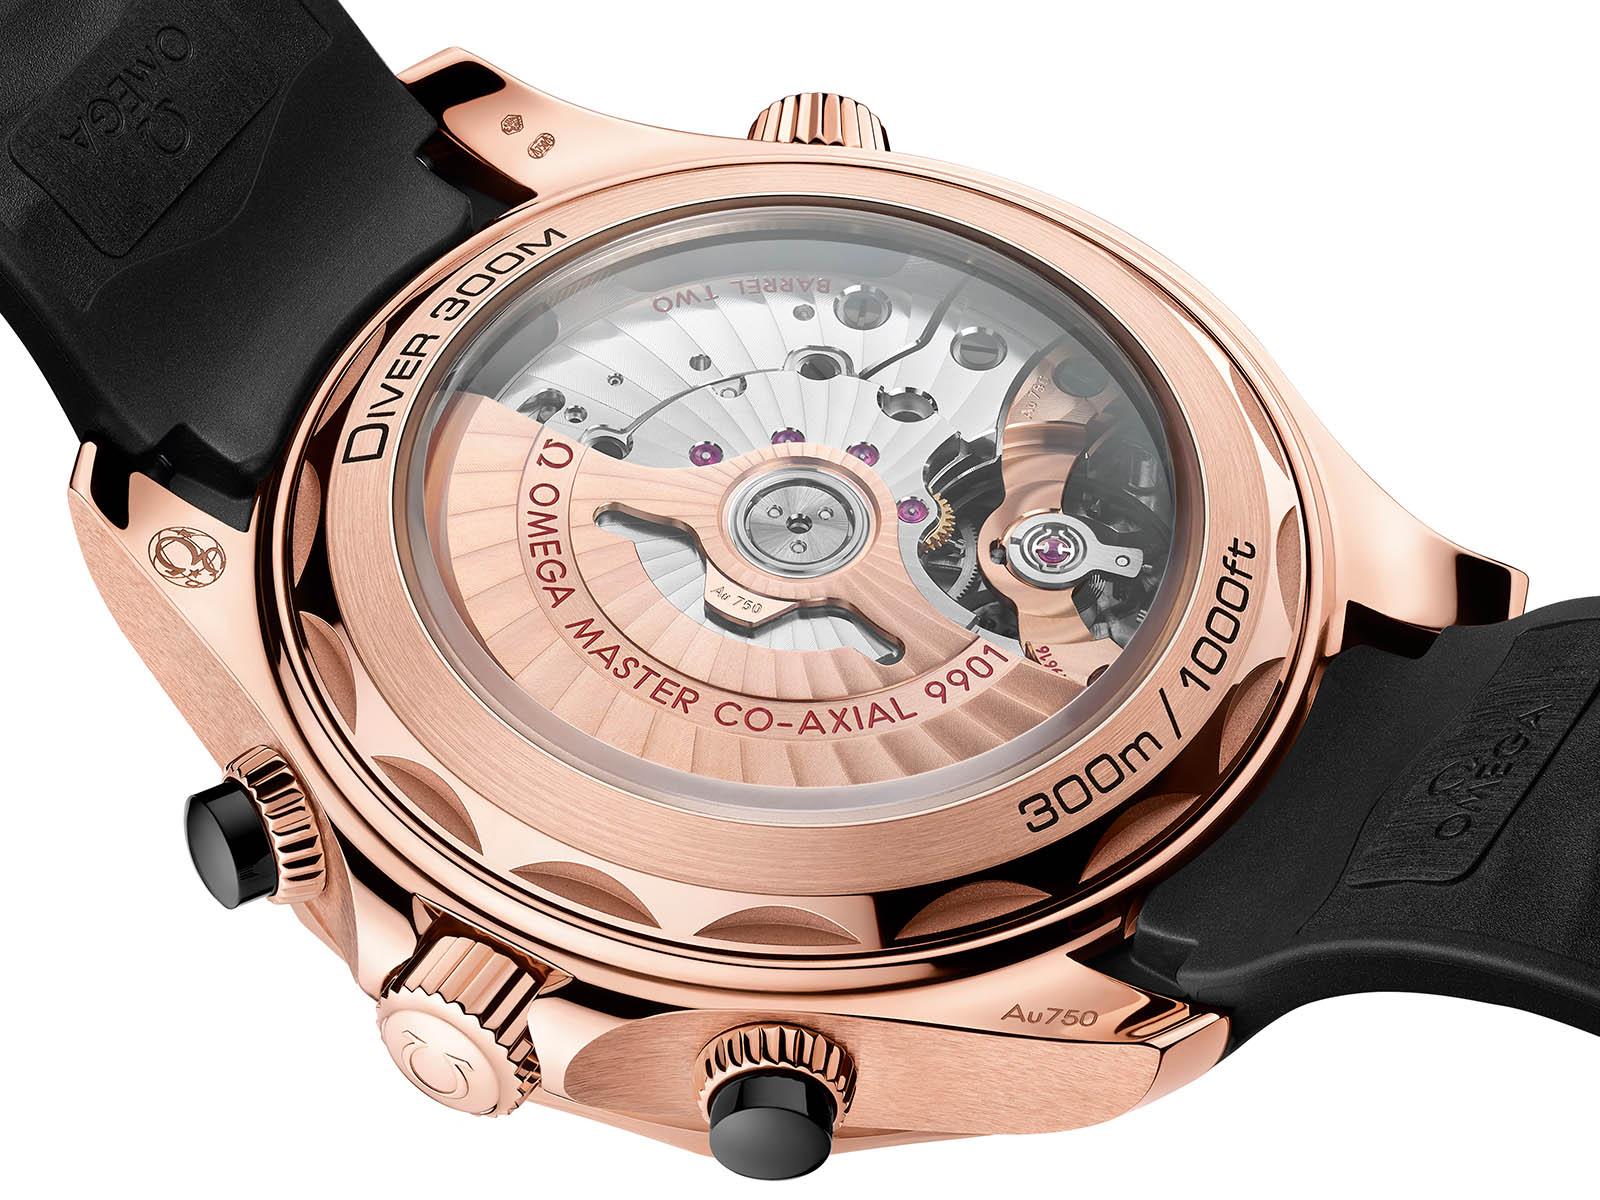 210-62-44-51-01-001-omega-seamaster-diver-300m-chronograph-5.jpg